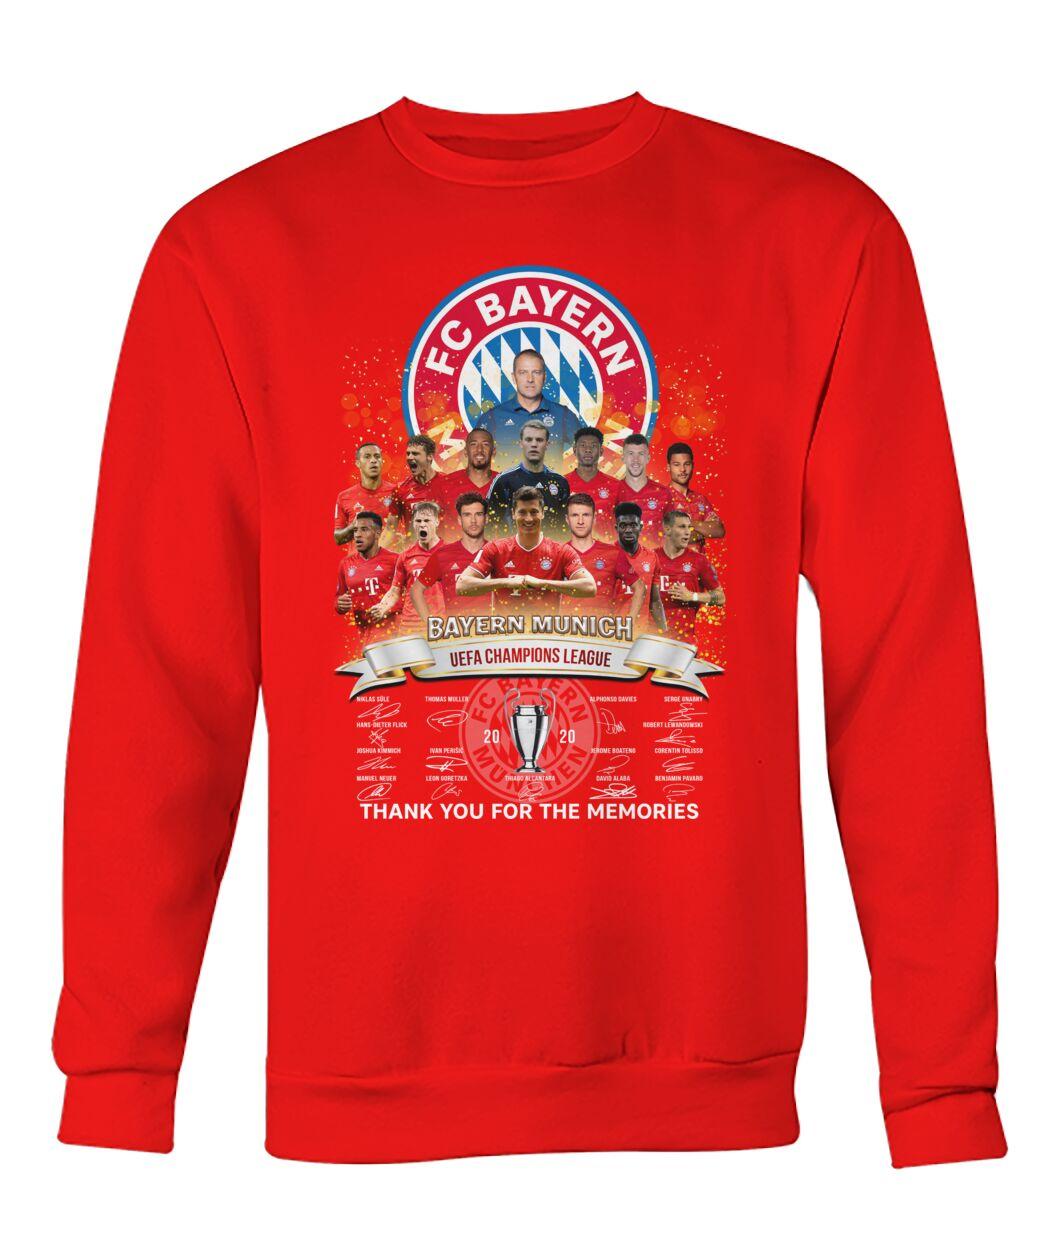 fc bayern munich 2020 uefa champions league thank you for the memories signatures sweatshirt